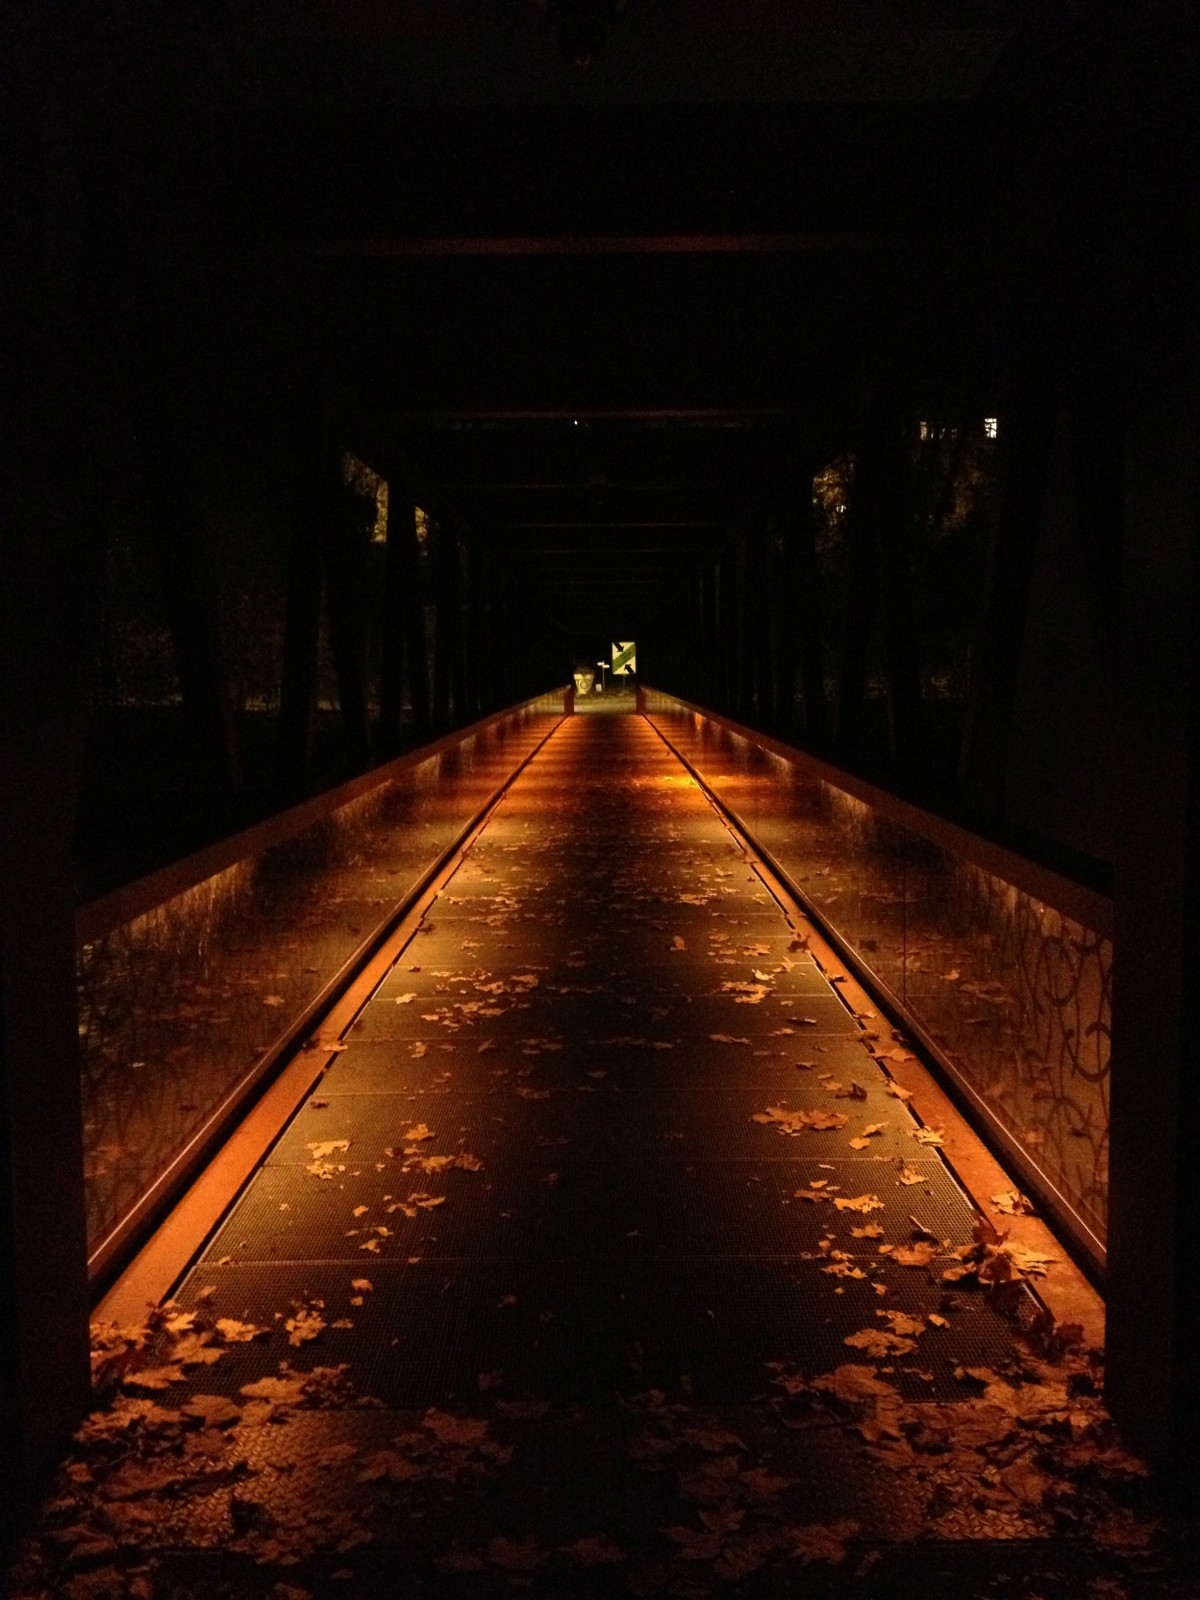 Free Images Light Bridge Night Sunlight Tunnel Dark